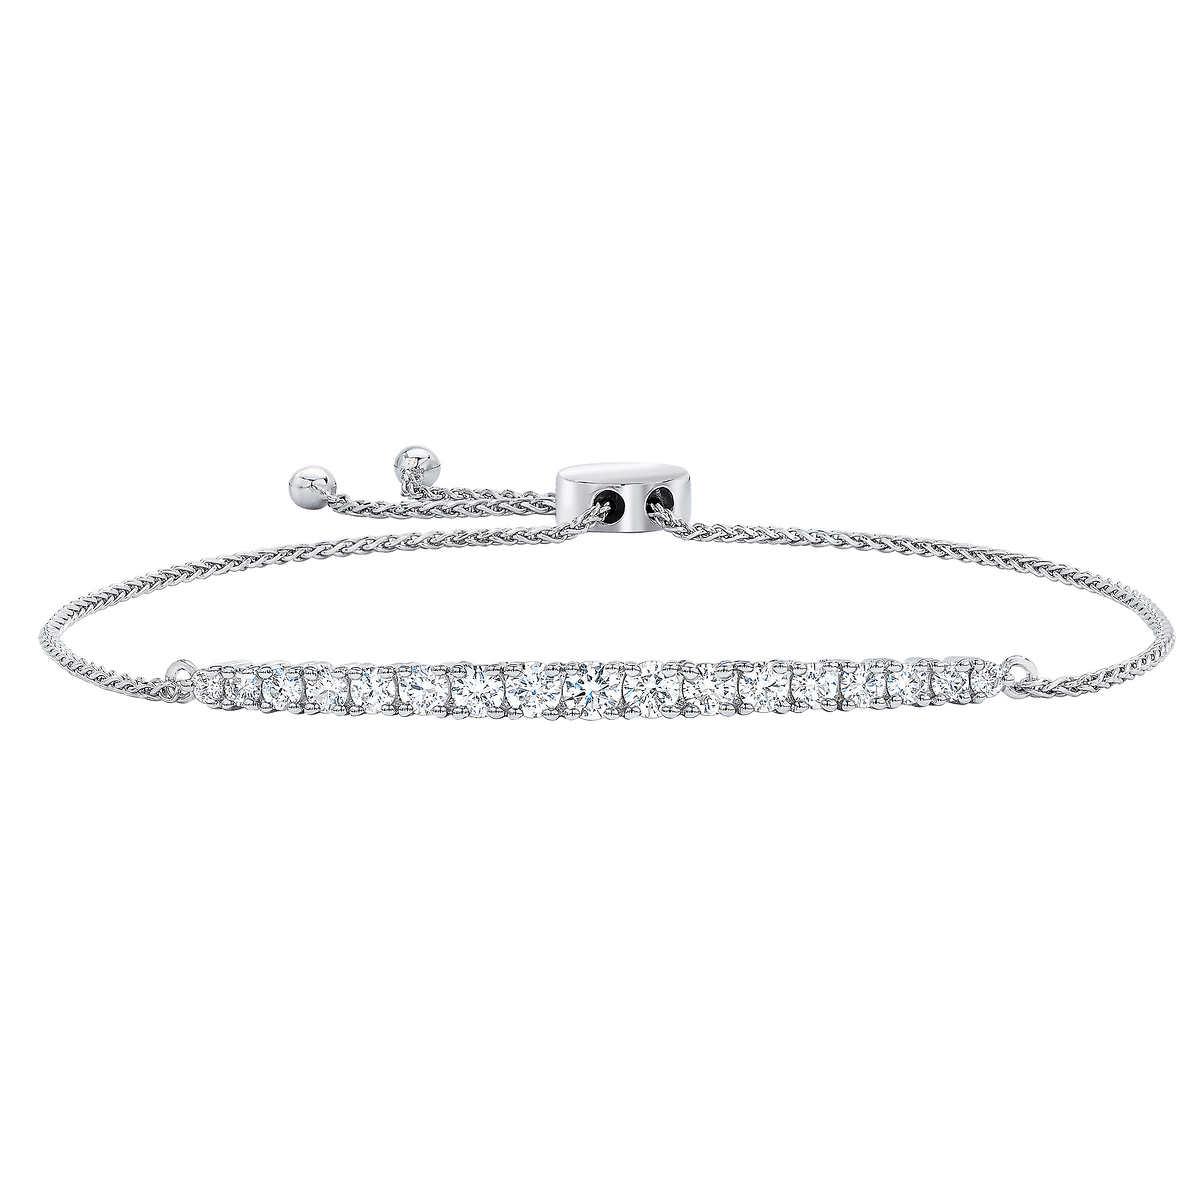 f2cb2adff ... Round Brilliant 1.00 ctw VS2 Clarity, I Color Diamond 14kt White Gold  Bracelet. 1 1